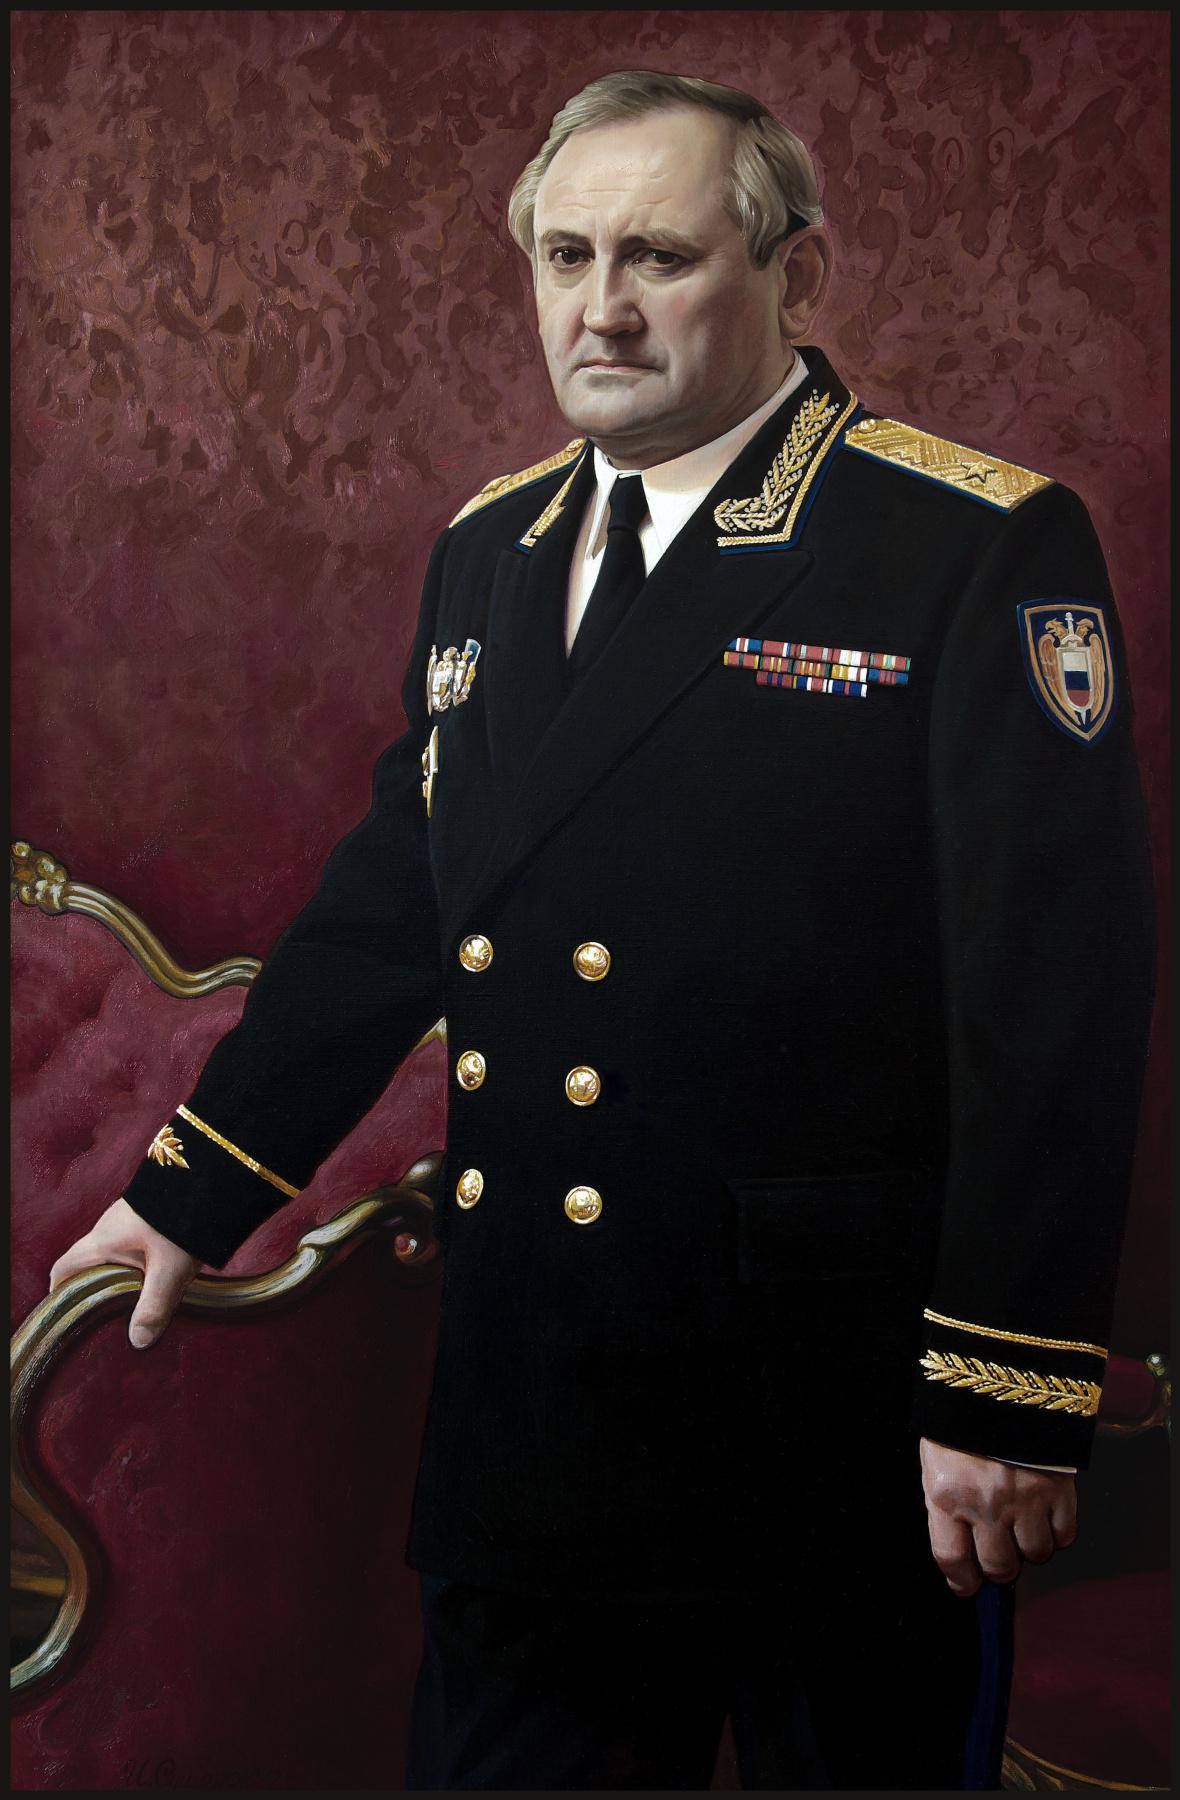 Sushienok64 @ mail.ru Mikhailovich Sushenok Igor. Portrait of the general